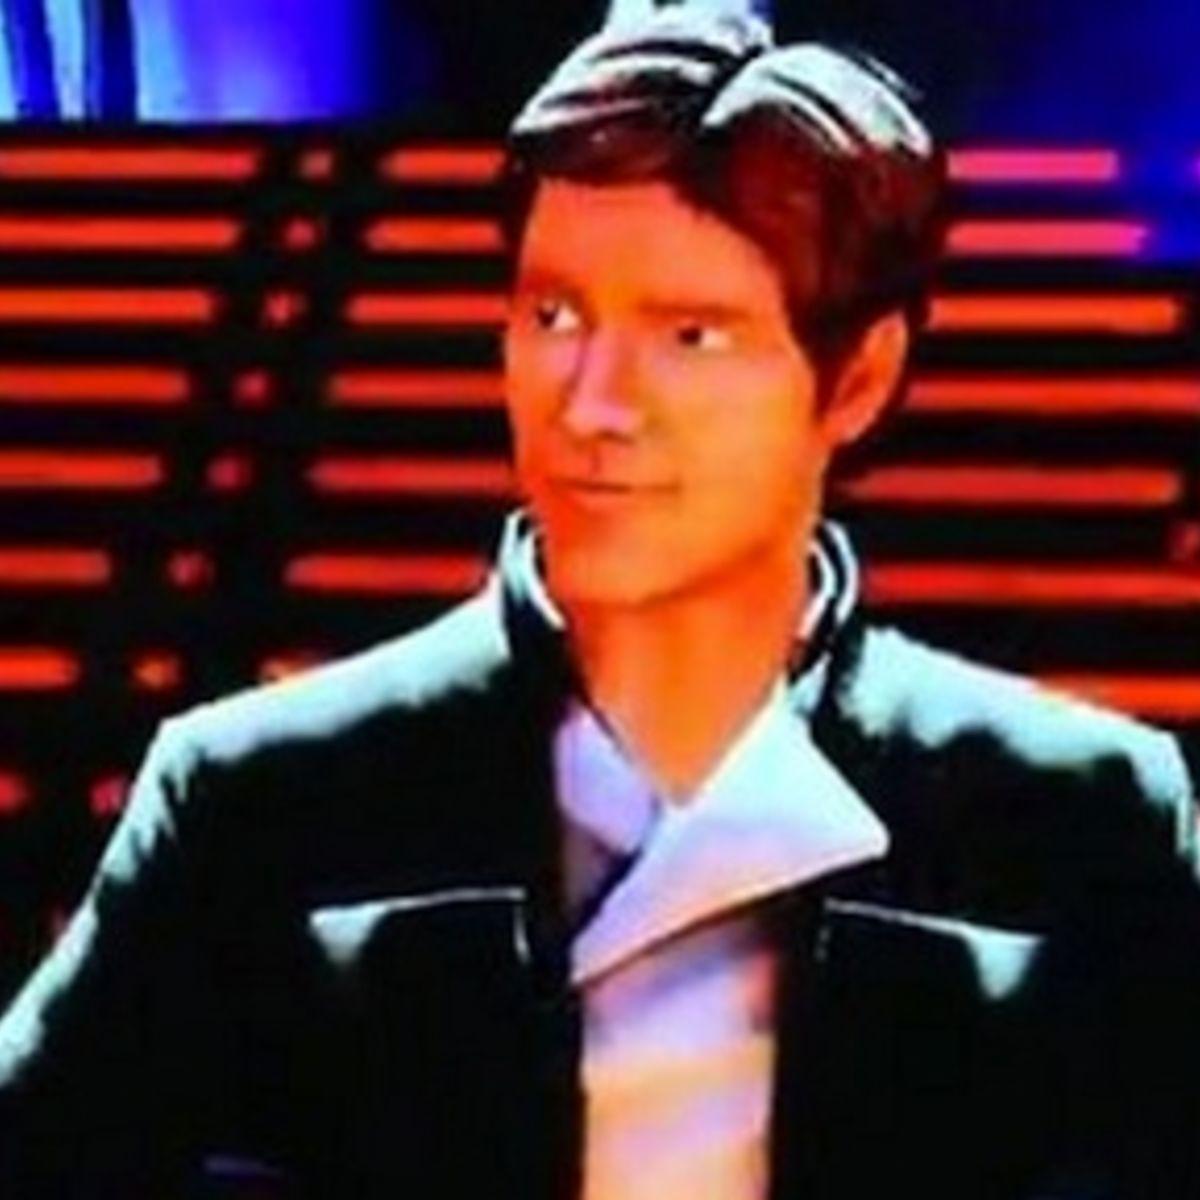 Kinect-Star-Wars-Han-Solo.jpg